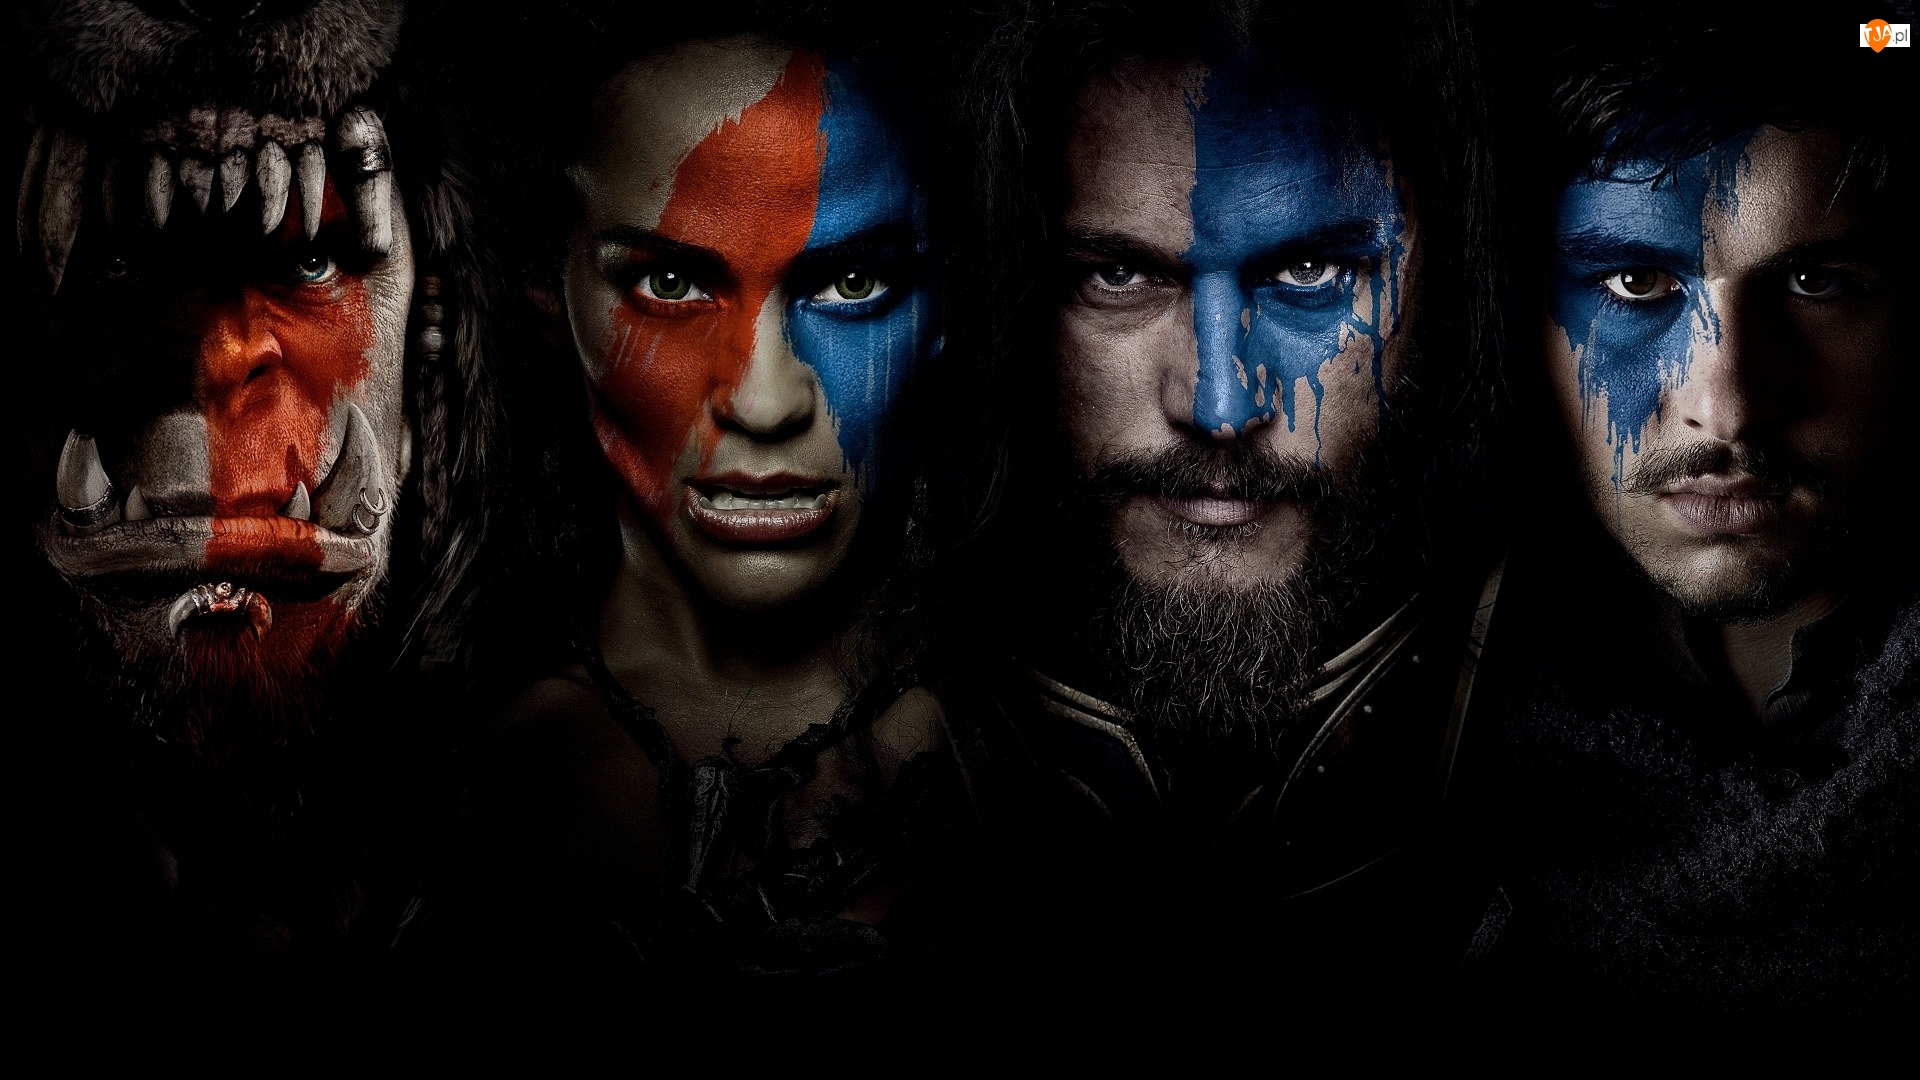 Ben Schnetzer , Warcraft : Początek, Paula Patton, Toby Kebbell, Travis Fimmel